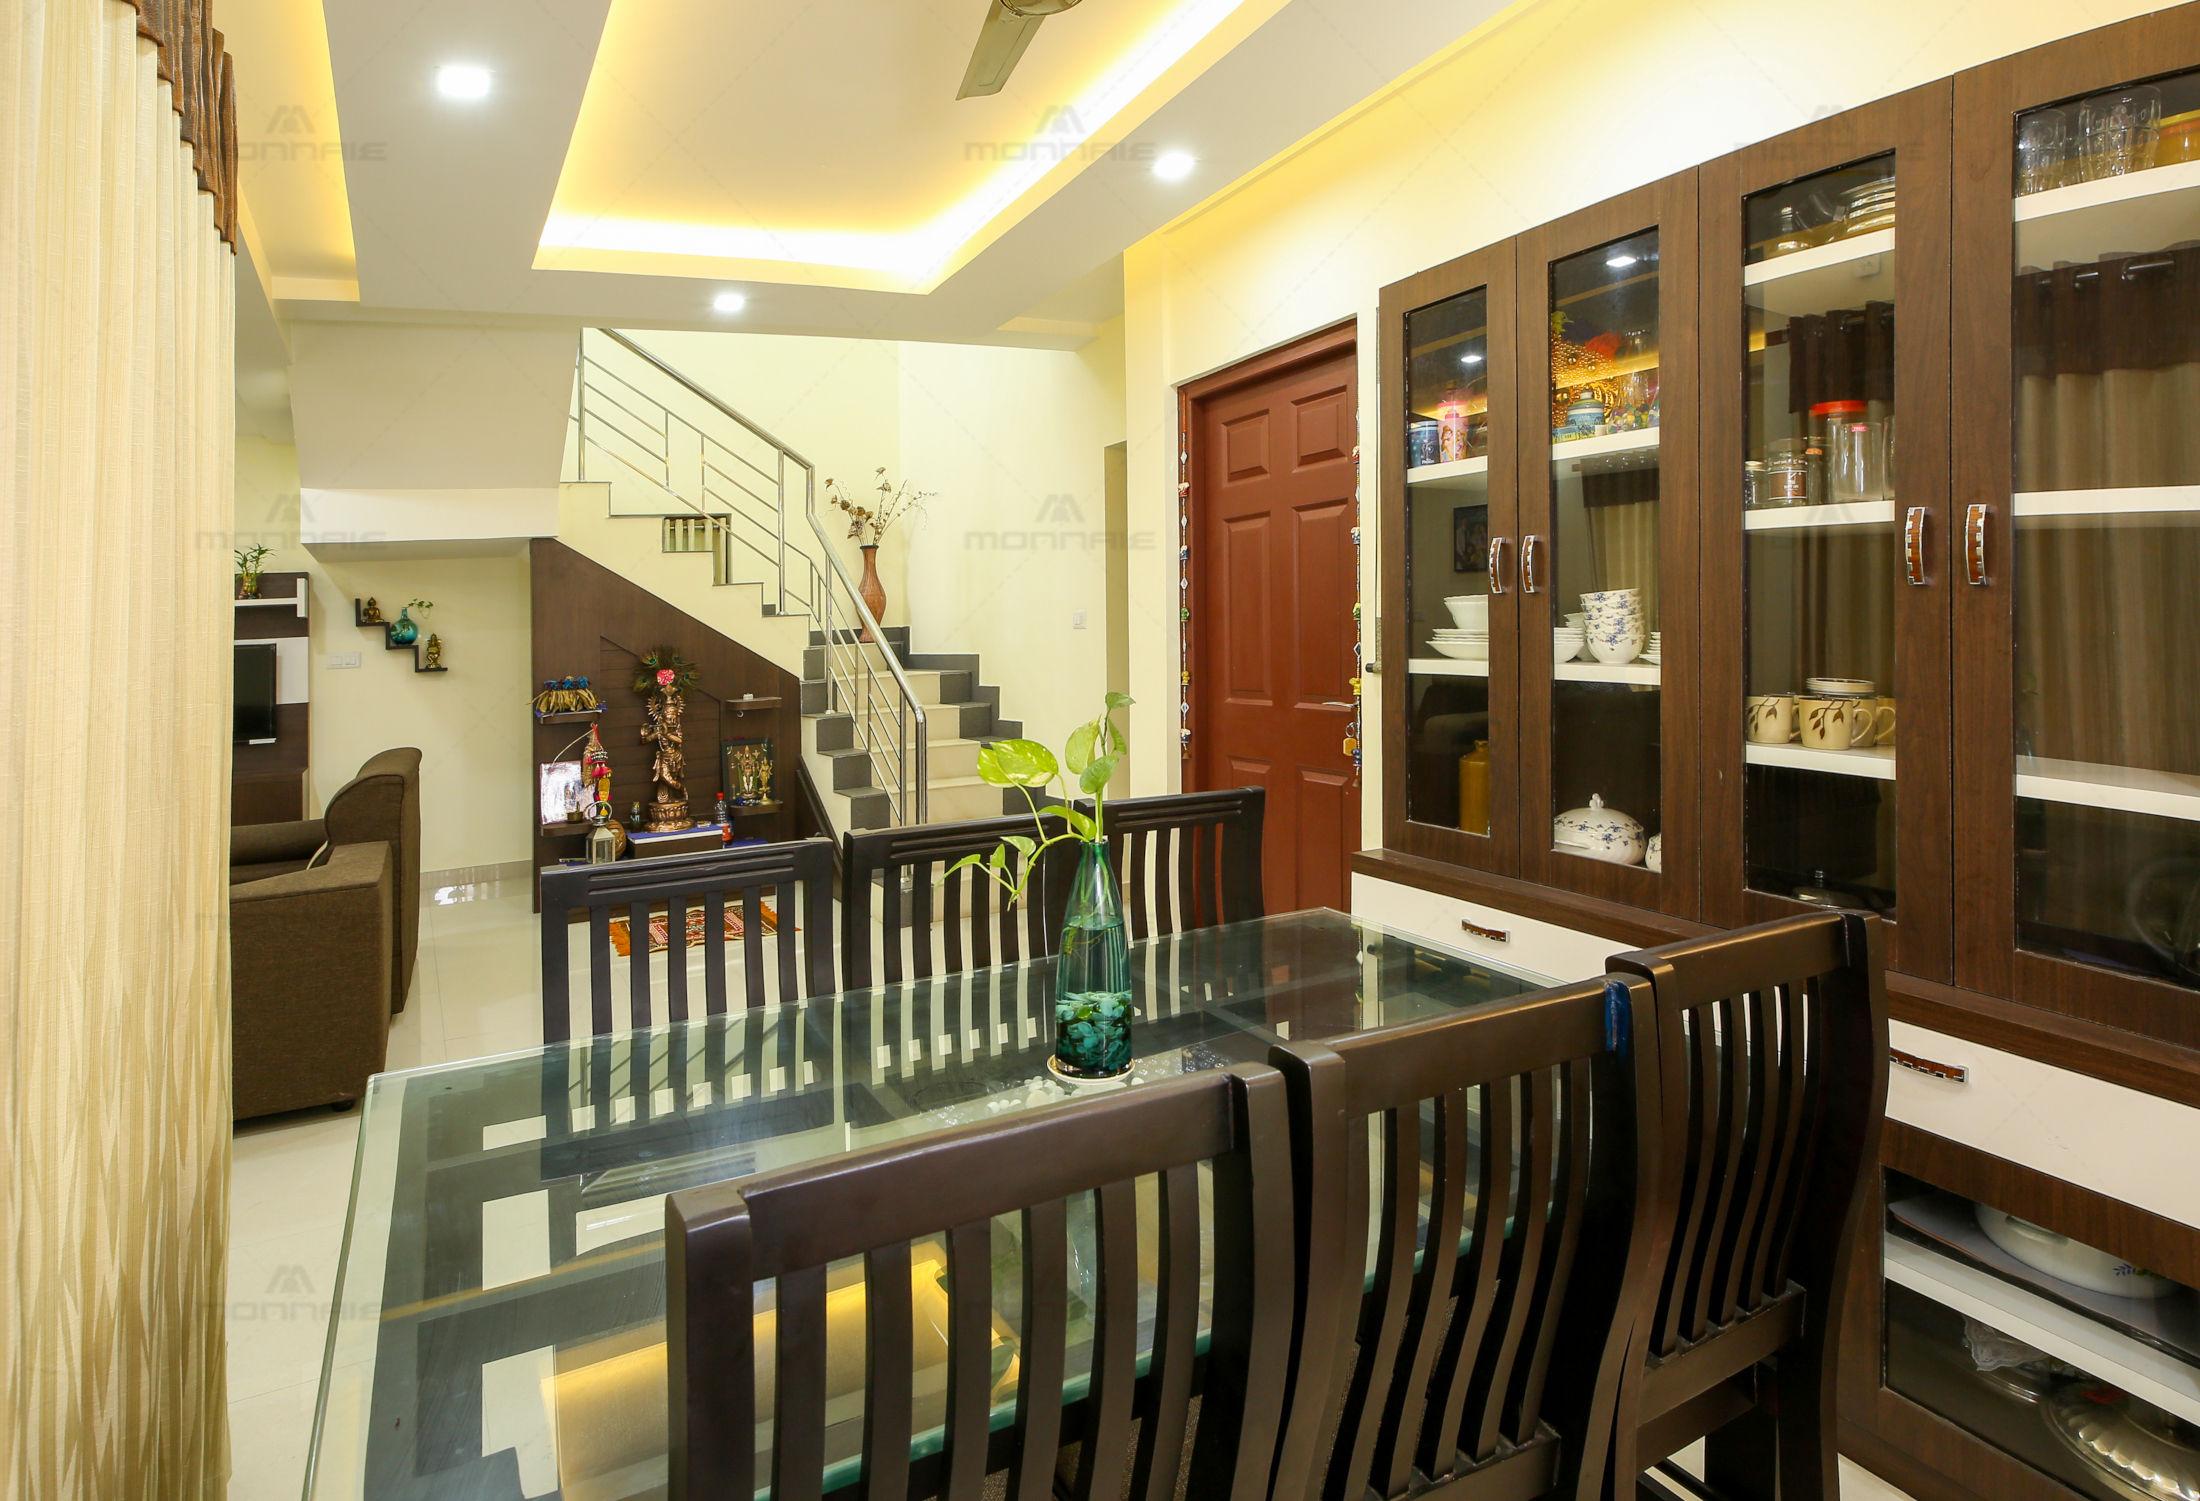 Minimalistic Home Interior Designers Kochi Kerala Monnaie Architects Interiors Medios De Comunicacion Fotos Y Videos 3 Archello